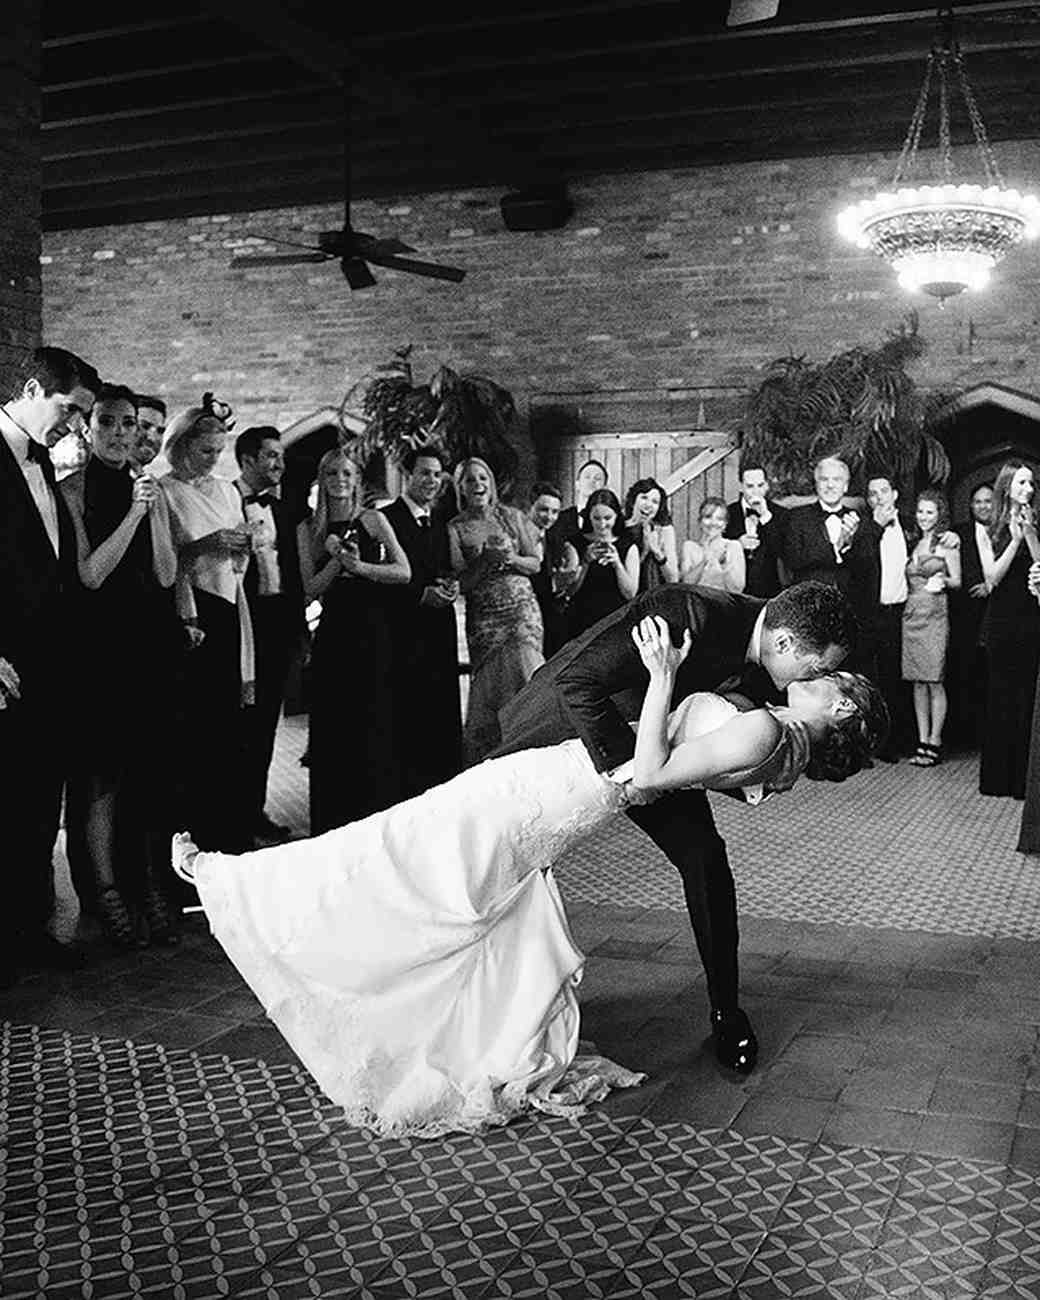 wedding-day-photography-tips-7-0216.jpg